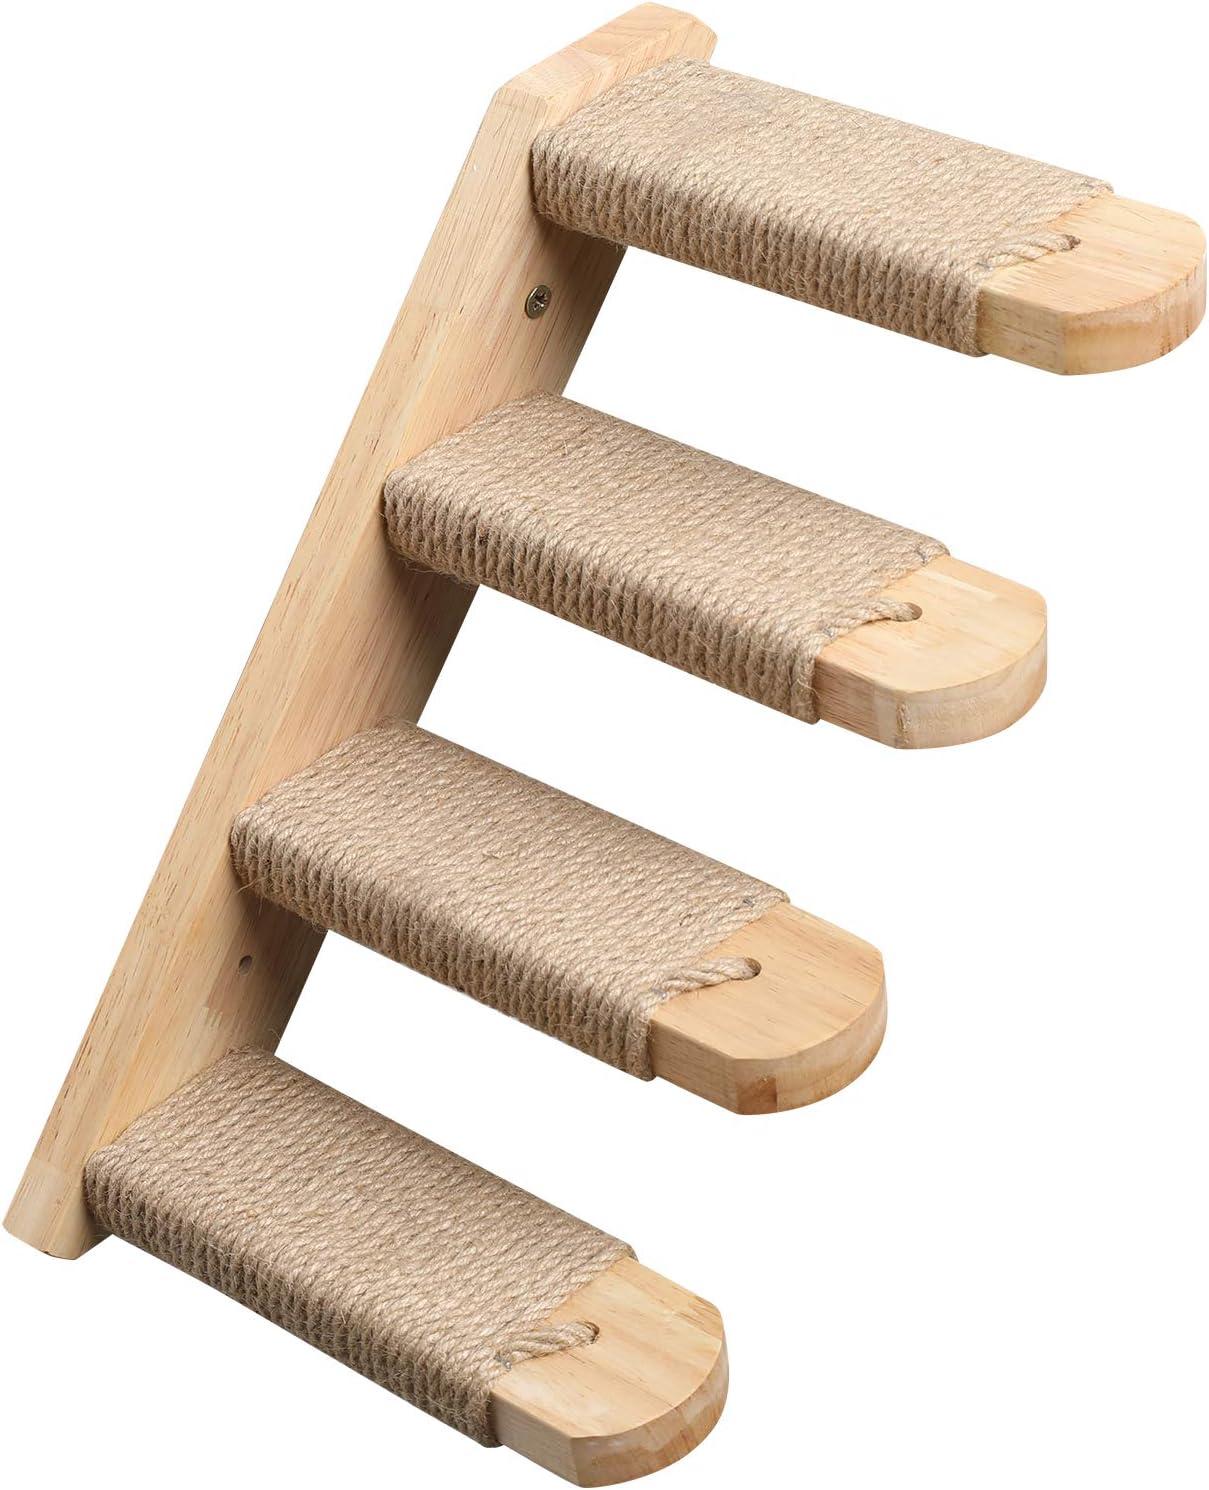 FUKUMARU Cat Climbing Shelf Wall Mounted, Four Step Cat Stairway with Jute Scratching for Cats Perch Platform Supplies